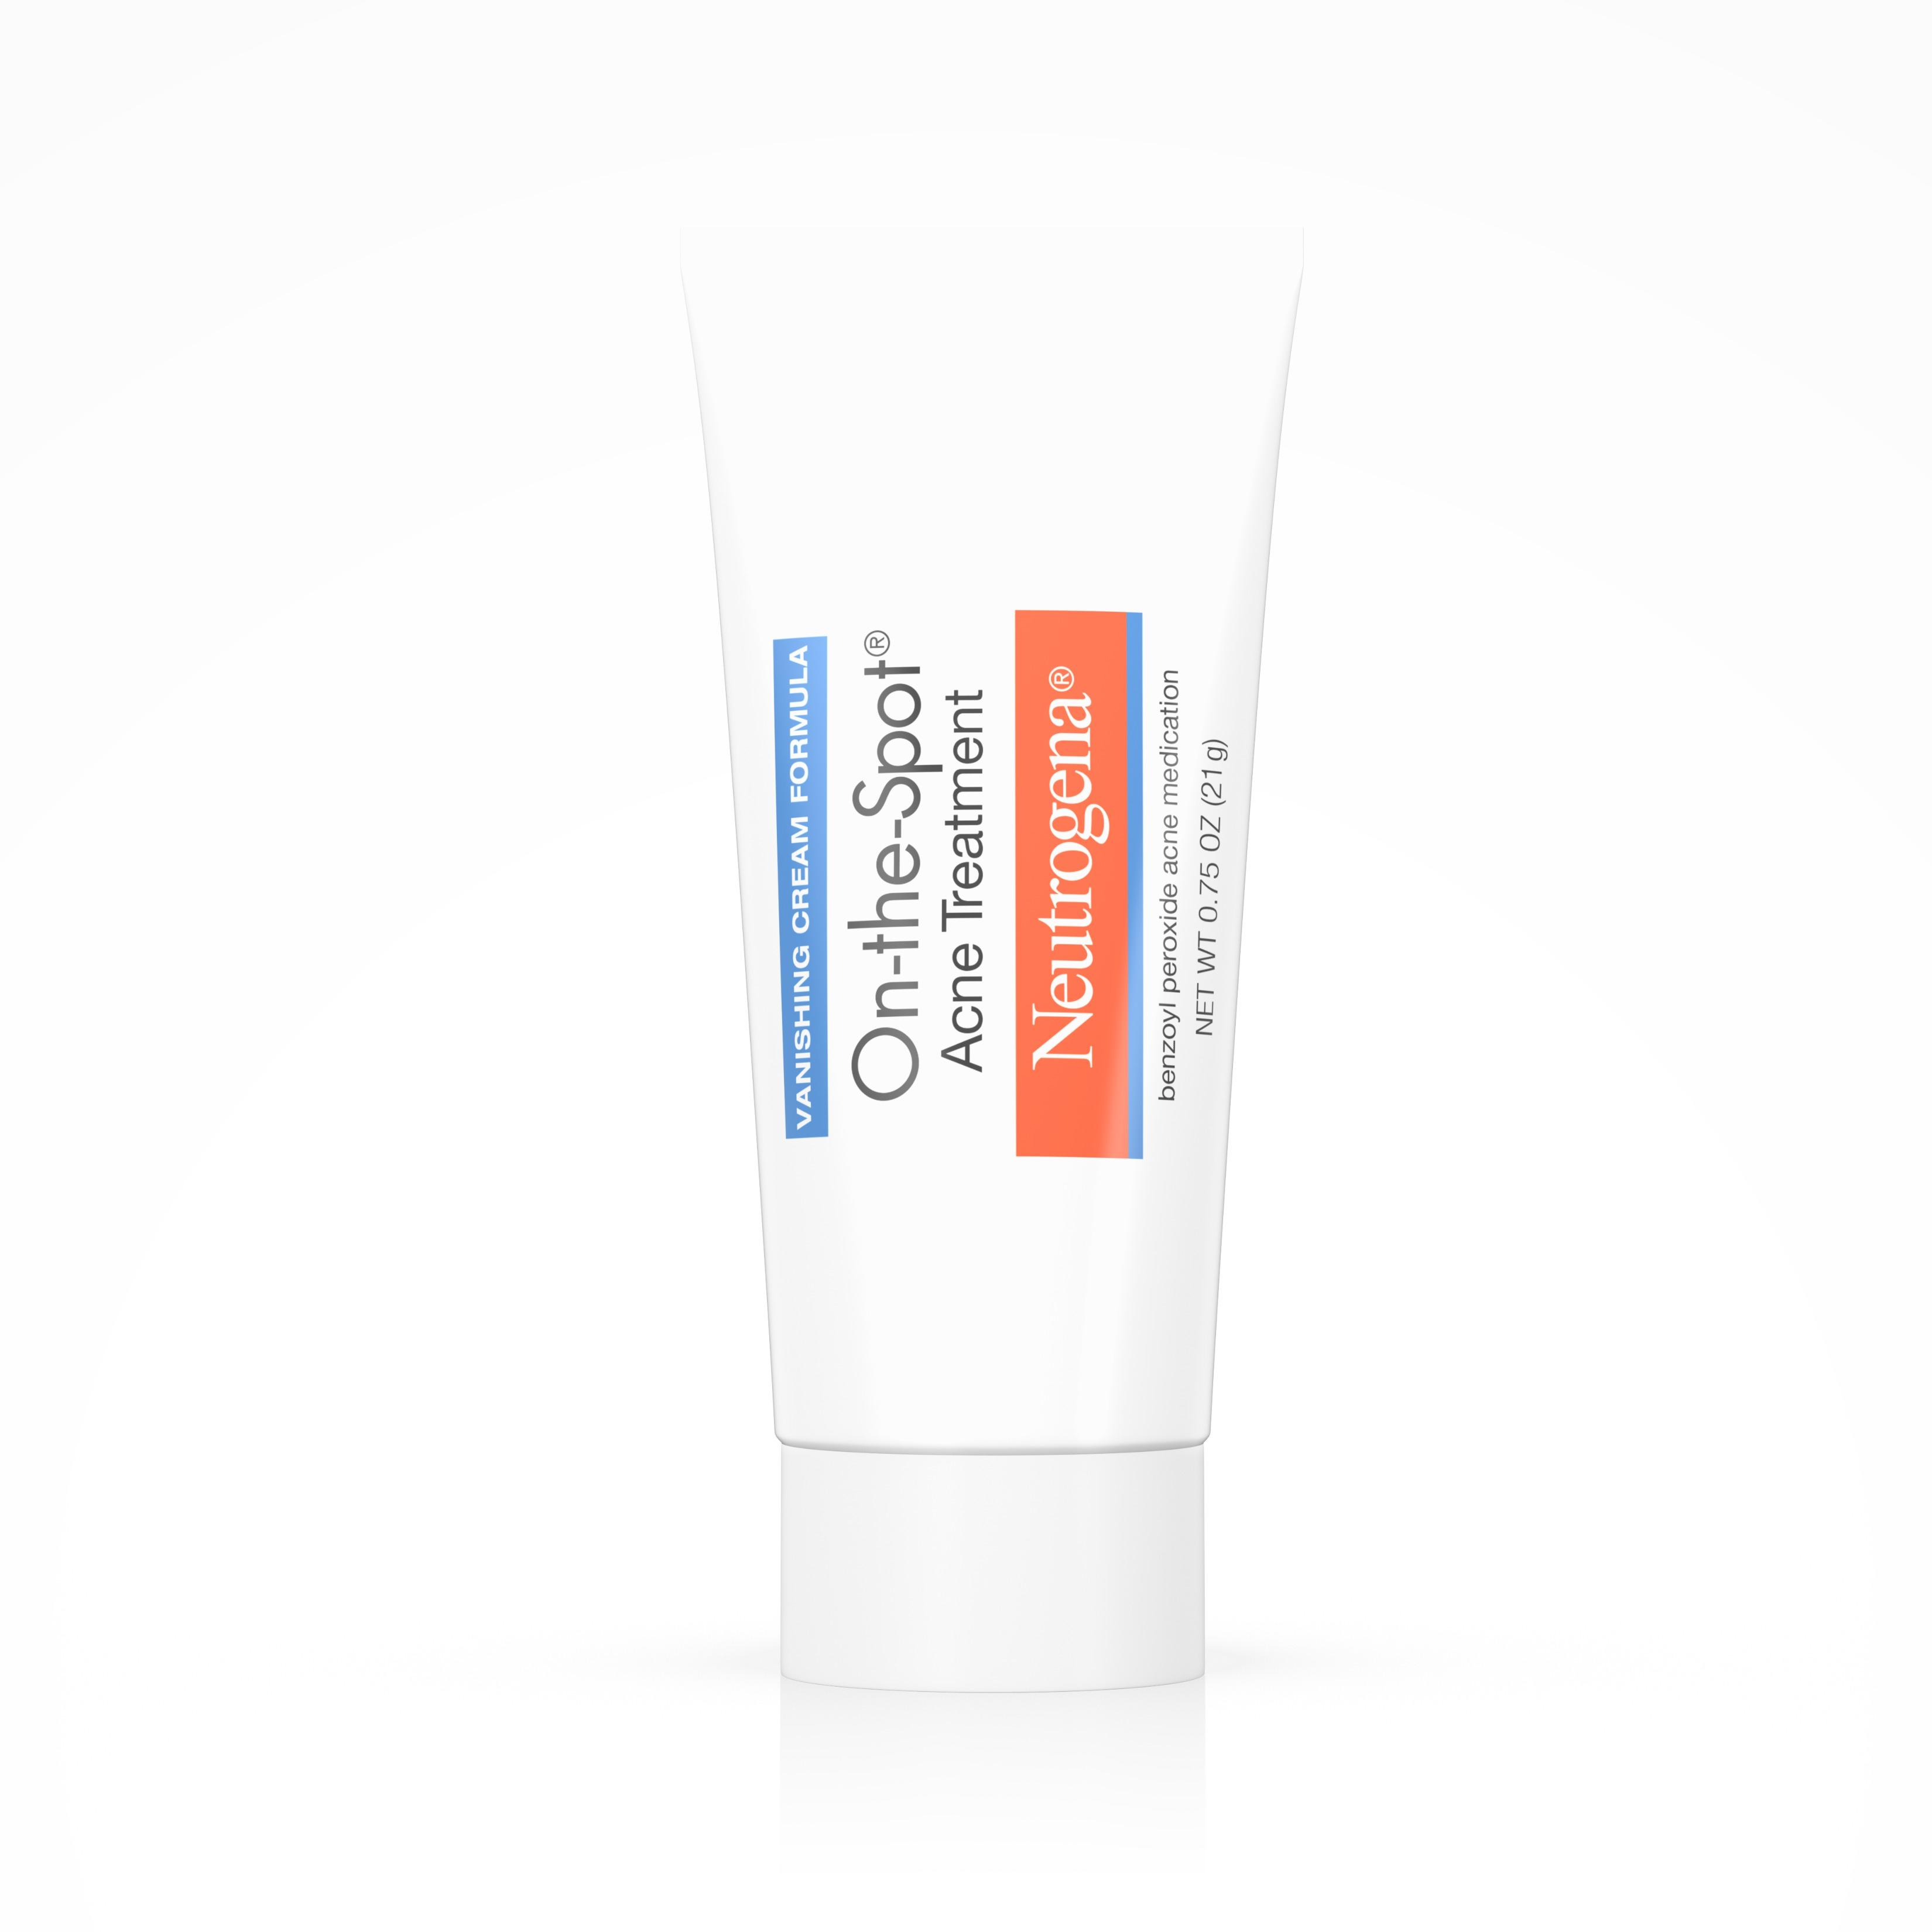 Neutrogena On-The-Spot Acne Treatment With Benzoyl Peroxide, 0.75 Oz.